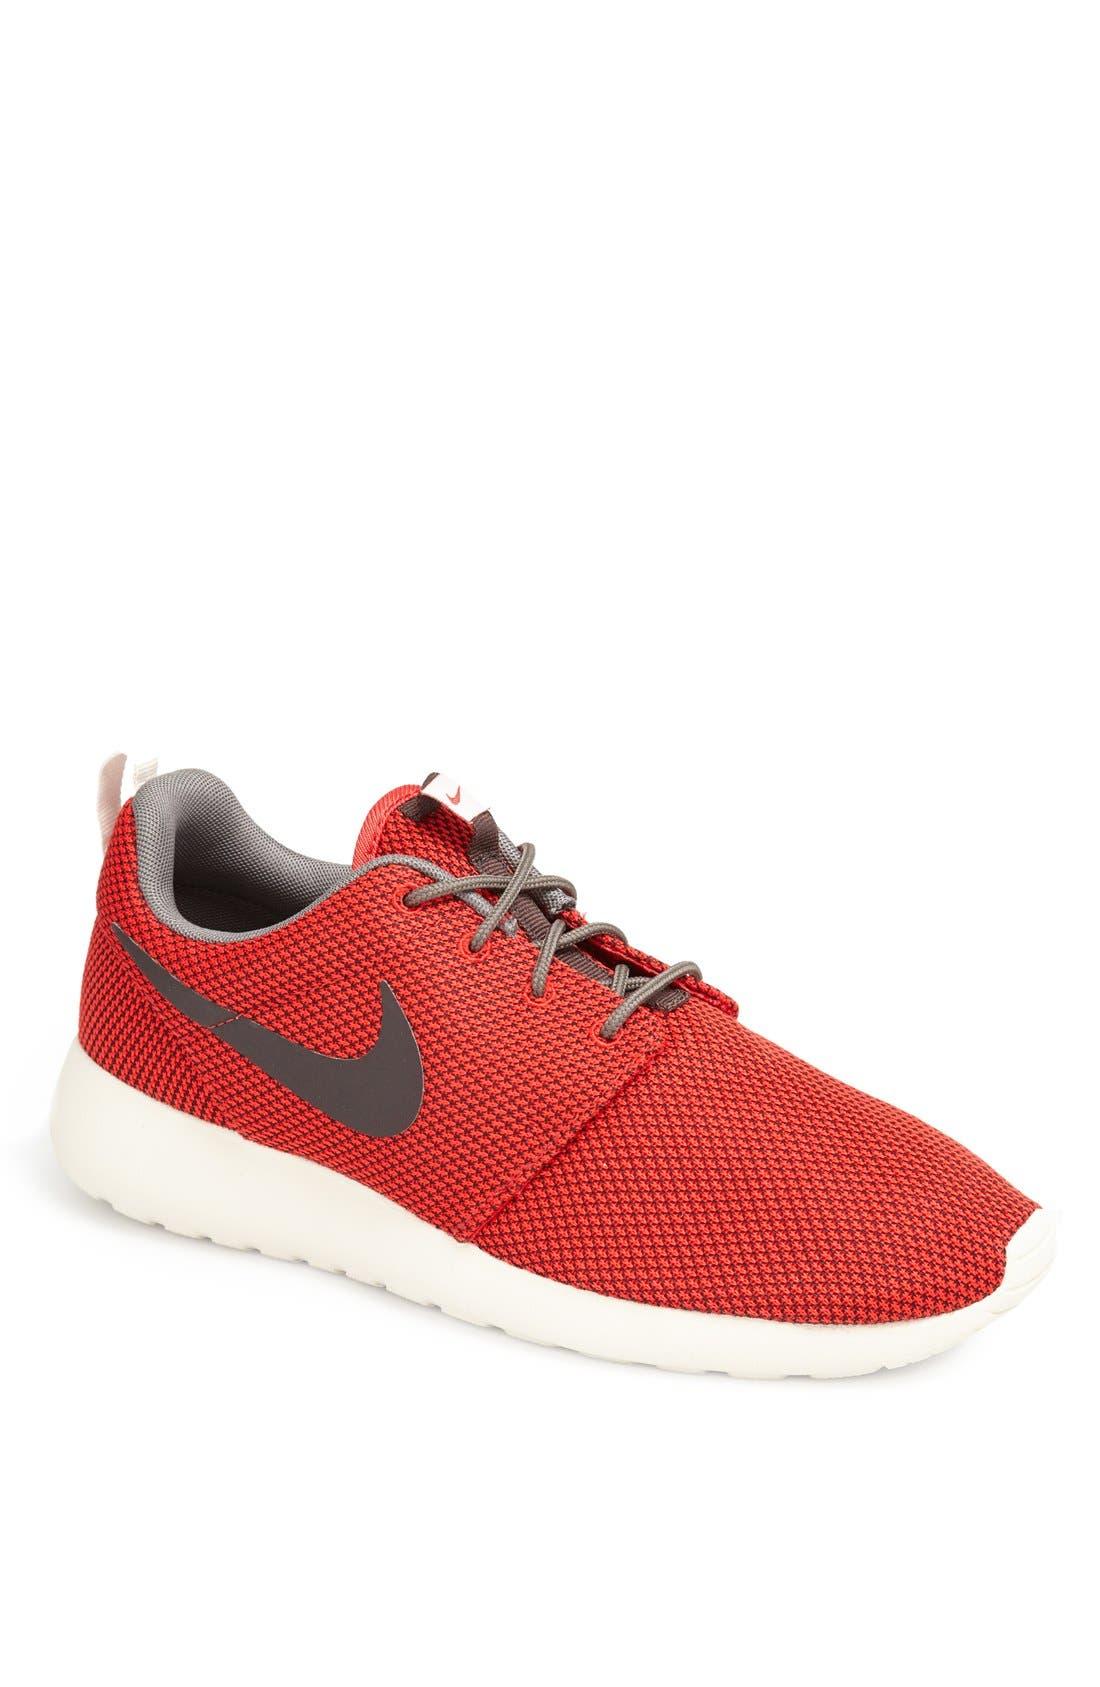 ,                             'Roshe Run' Sneaker,                             Main thumbnail 135, color,                             622